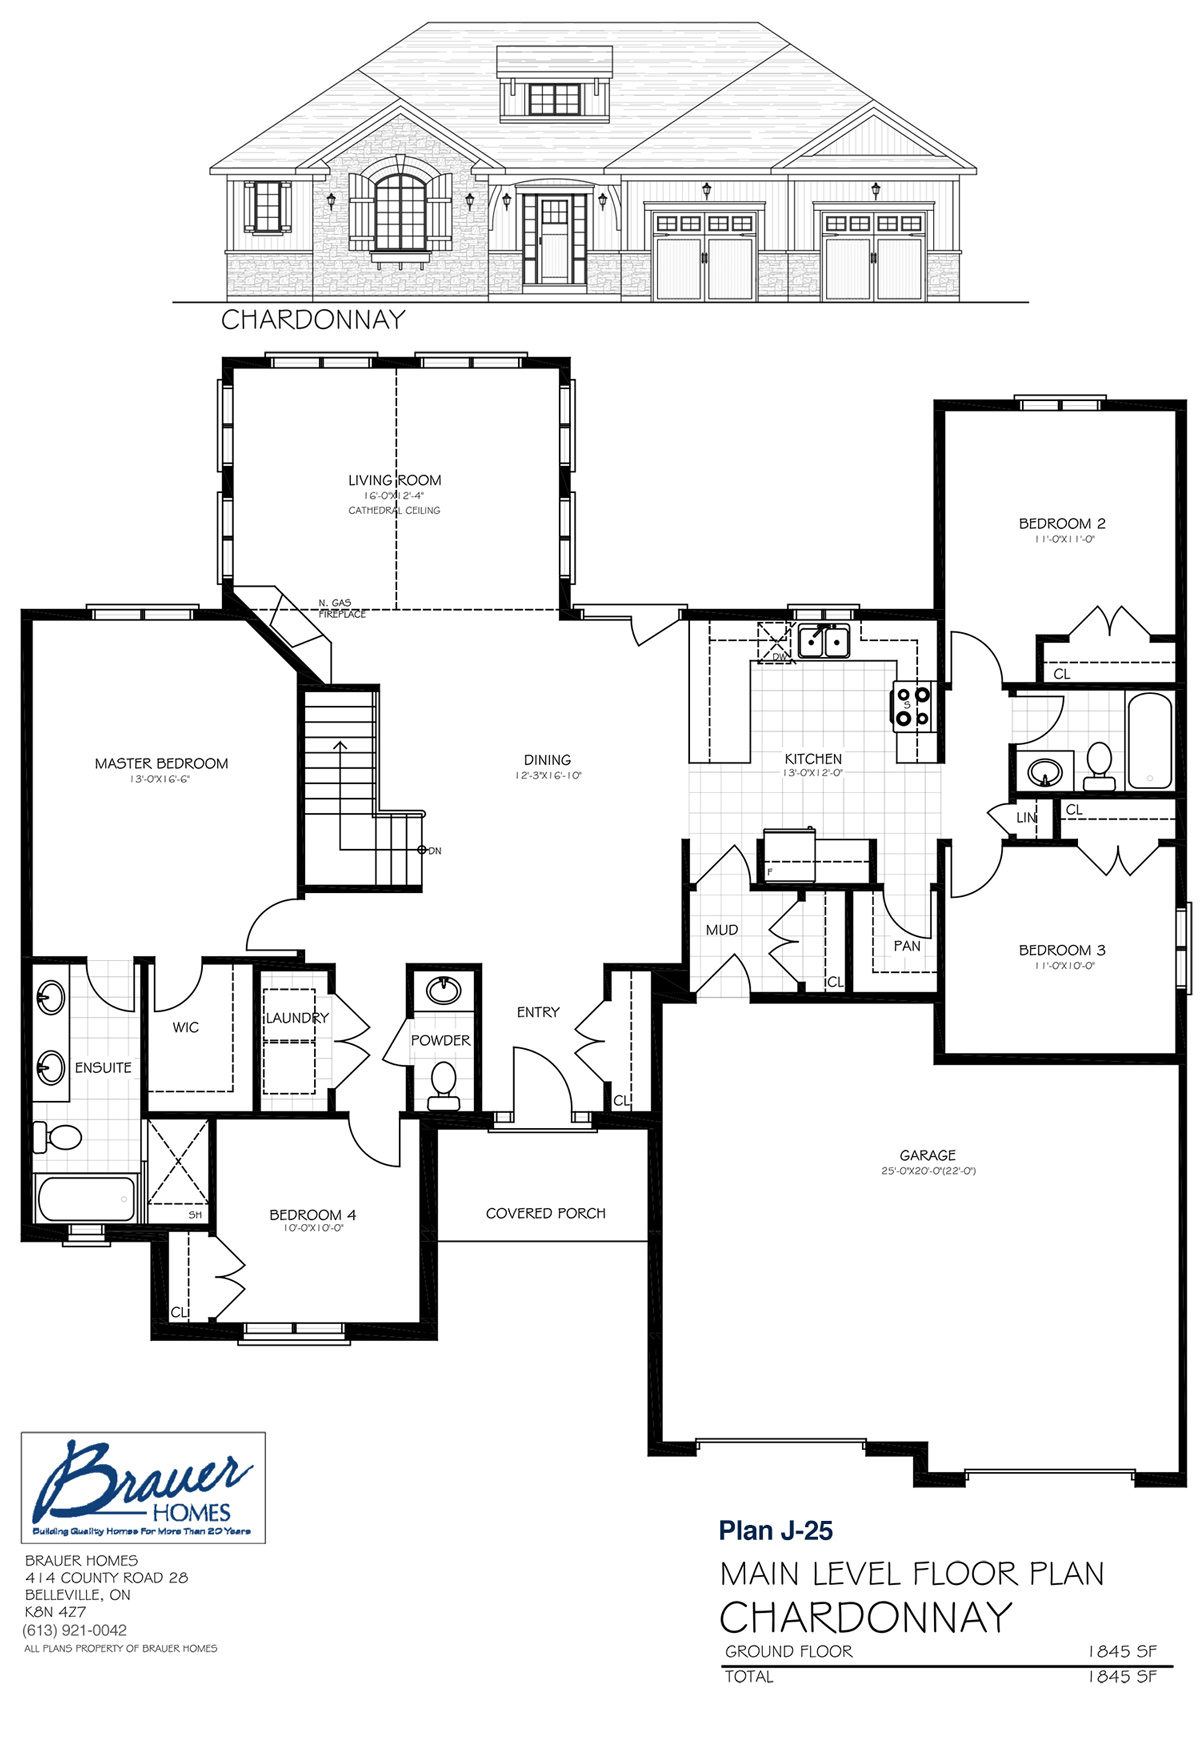 Brauer Build Plan J-25